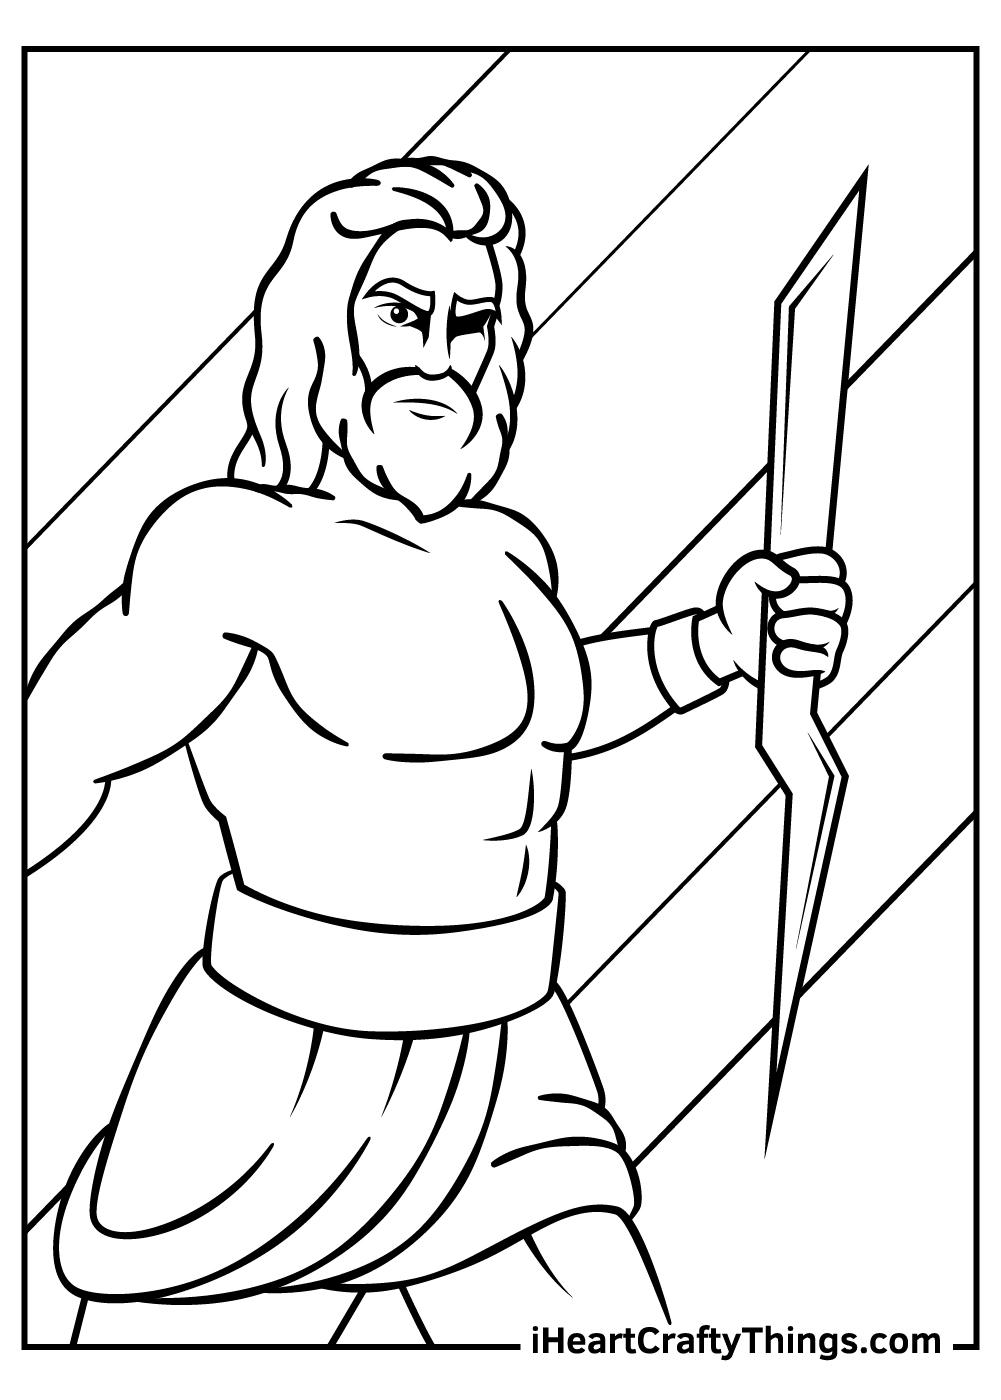 greek mythology coloring pages Zeus